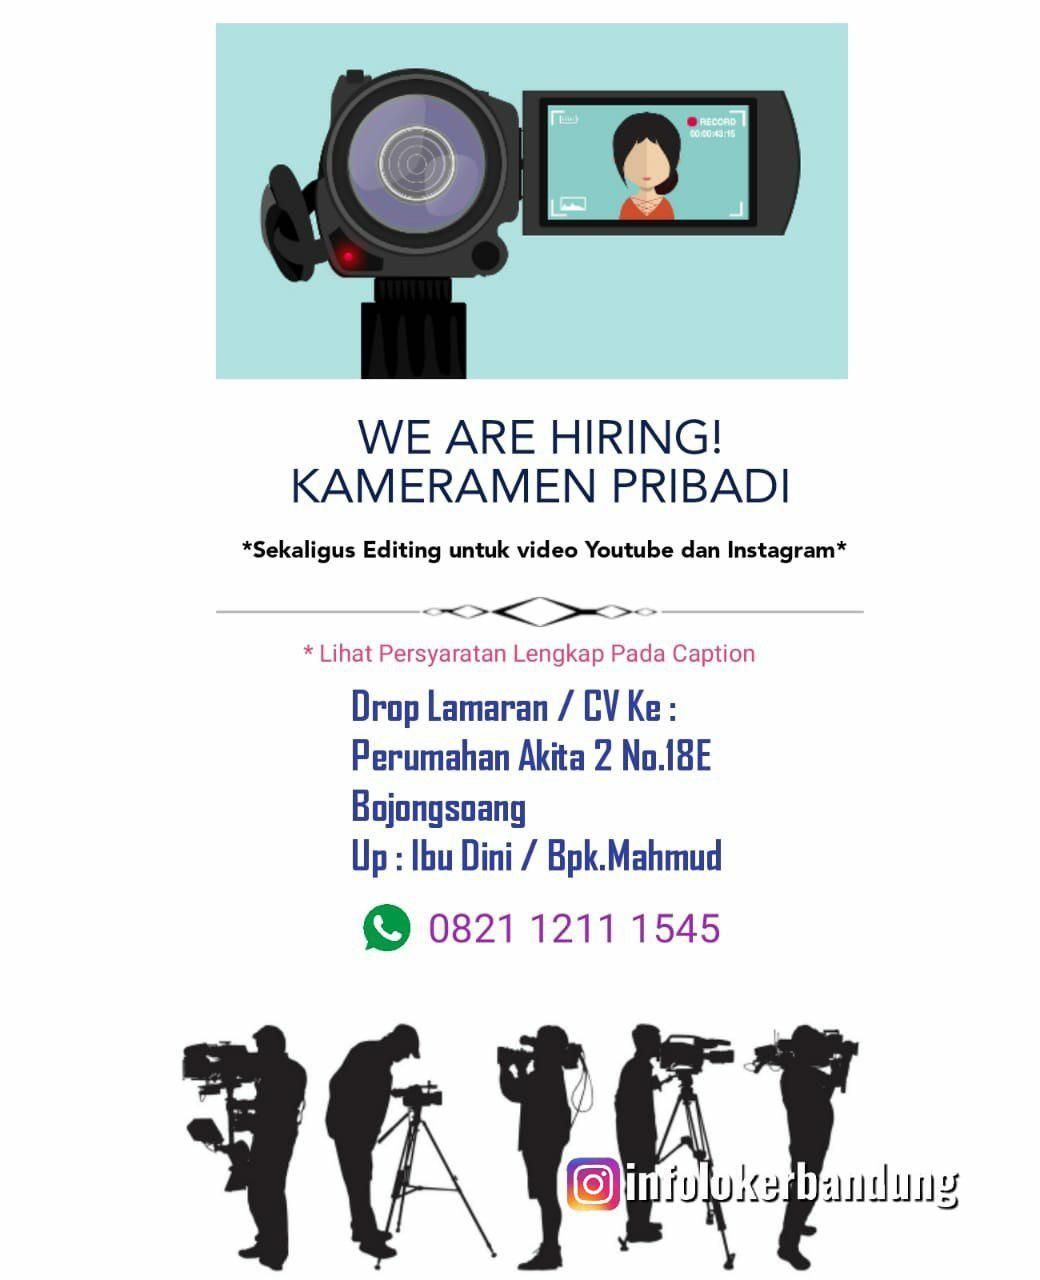 Lowongan Kerja Kameramen Pribadi Rocket Dimsum Bandung Mei 2019